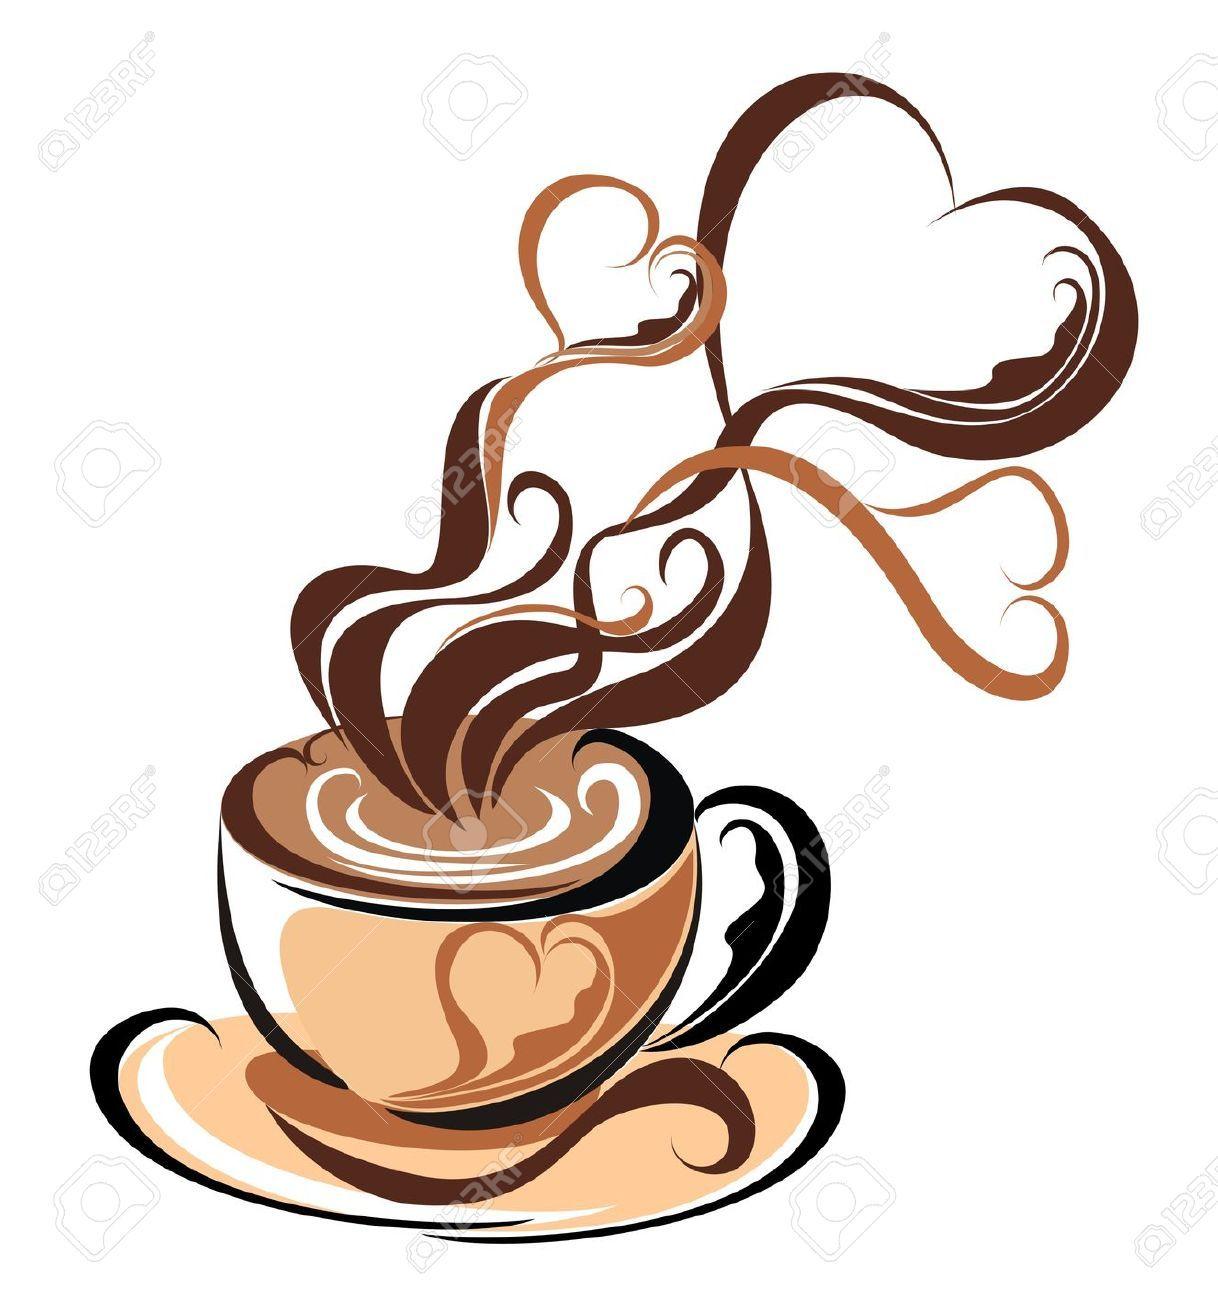 coffee cup clip art Google Search Coffee heart, Coffee